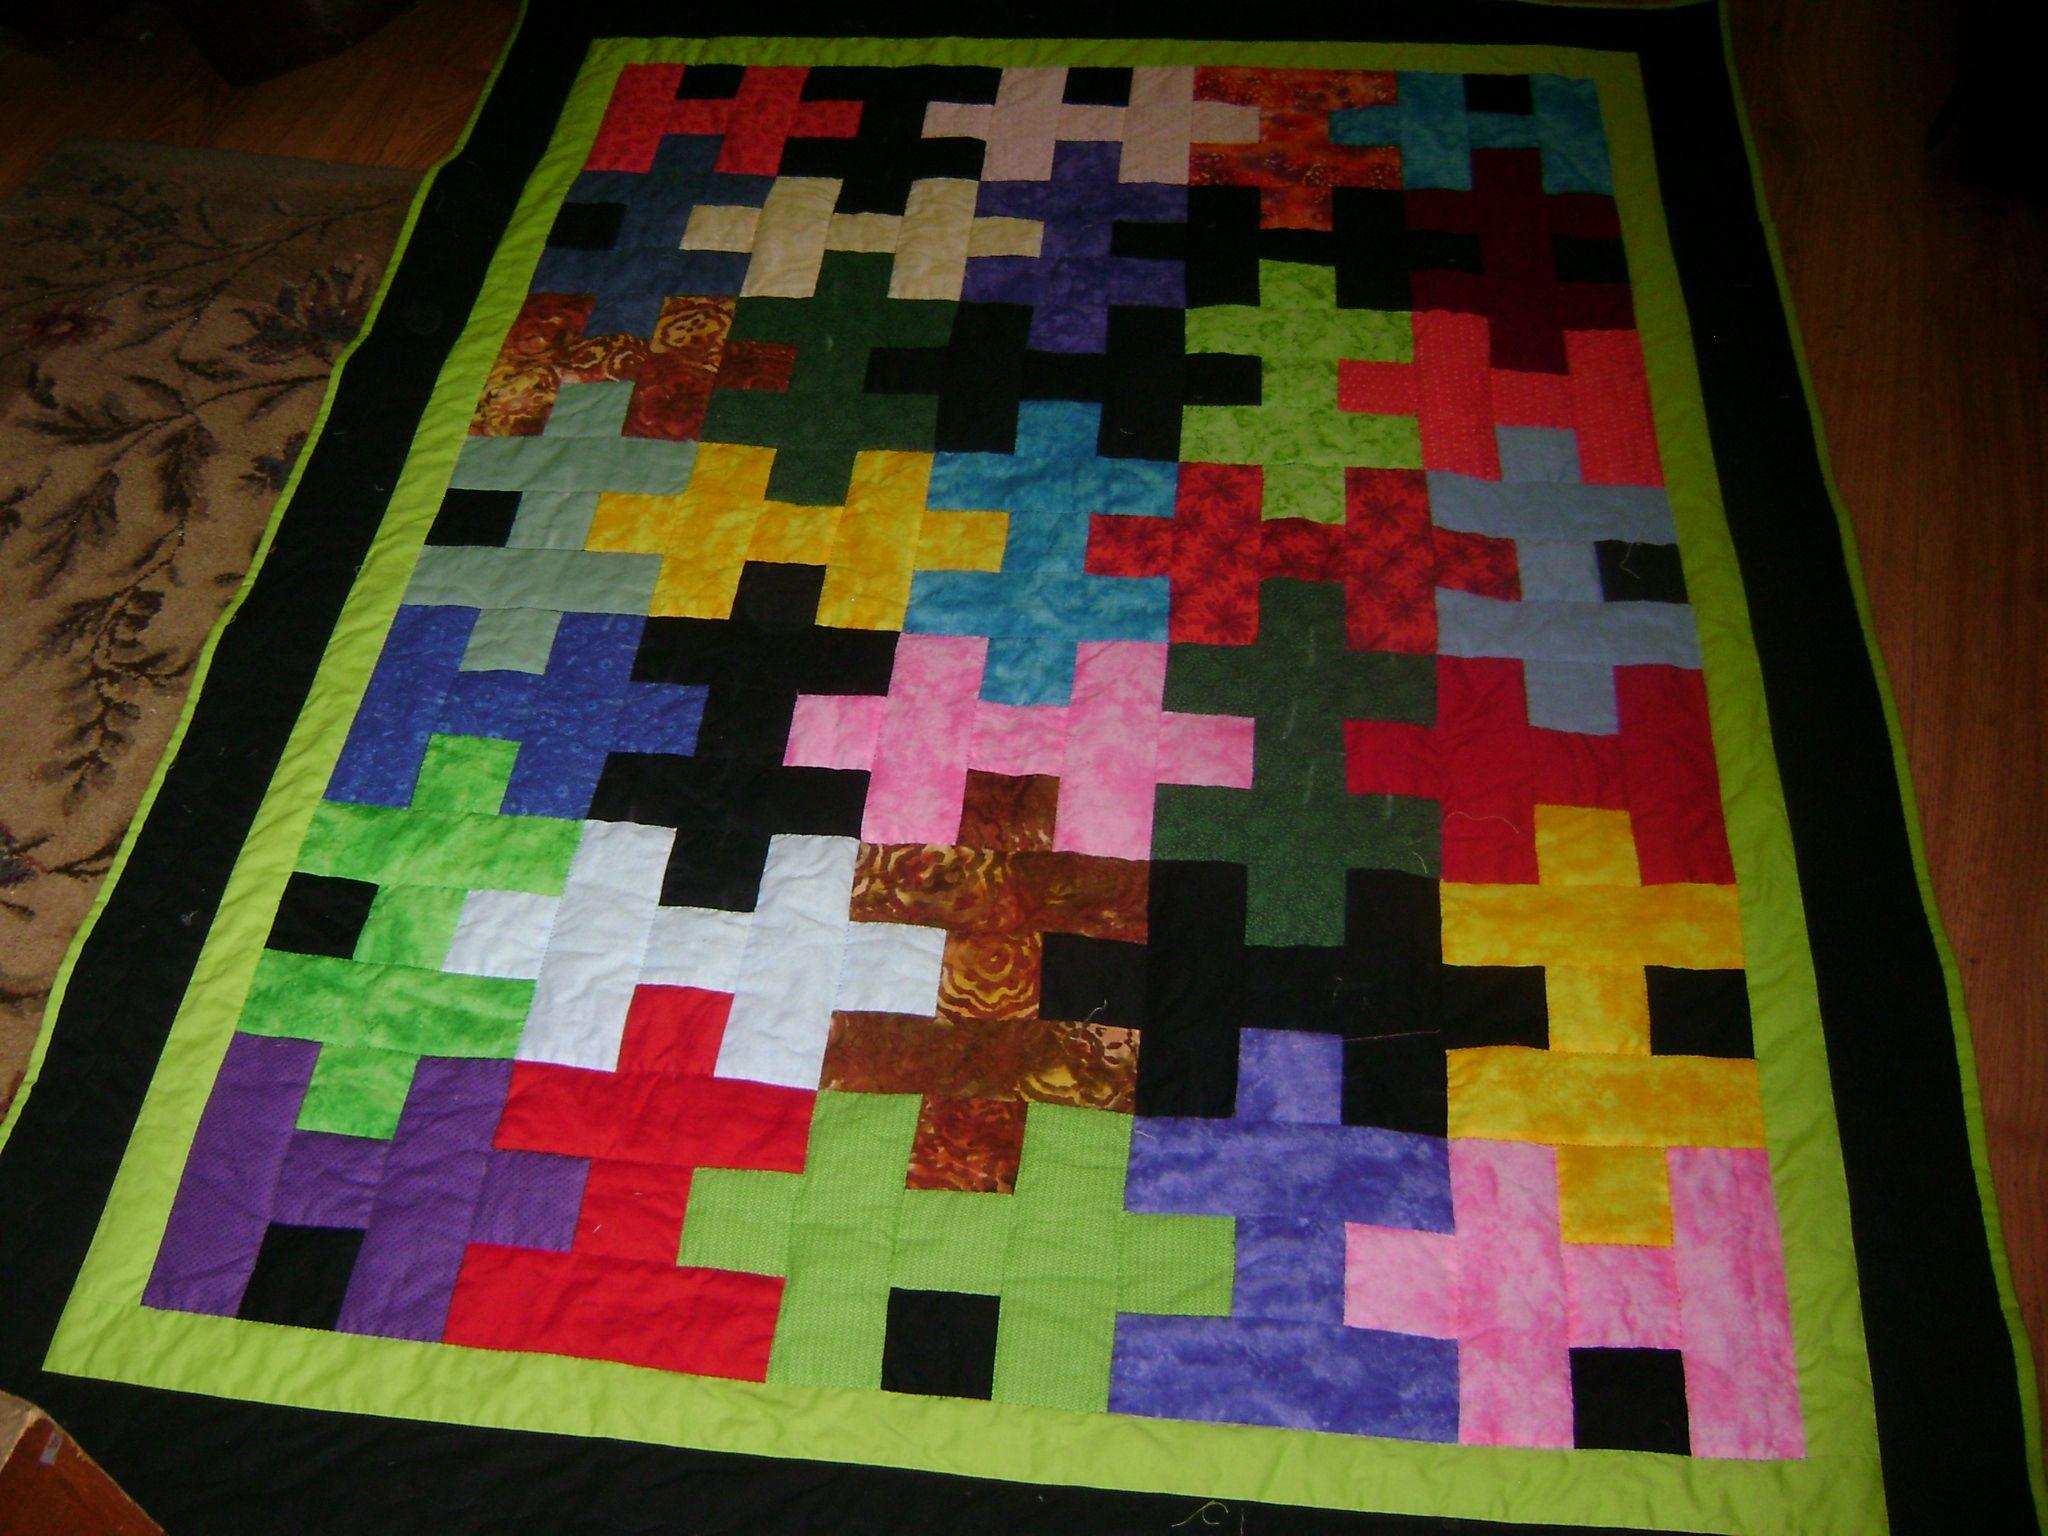 Jigsaw puzzle quilt. Peace, Robert from nancysfabrics.com | Puzzle ... : jb quilting - Adamdwight.com